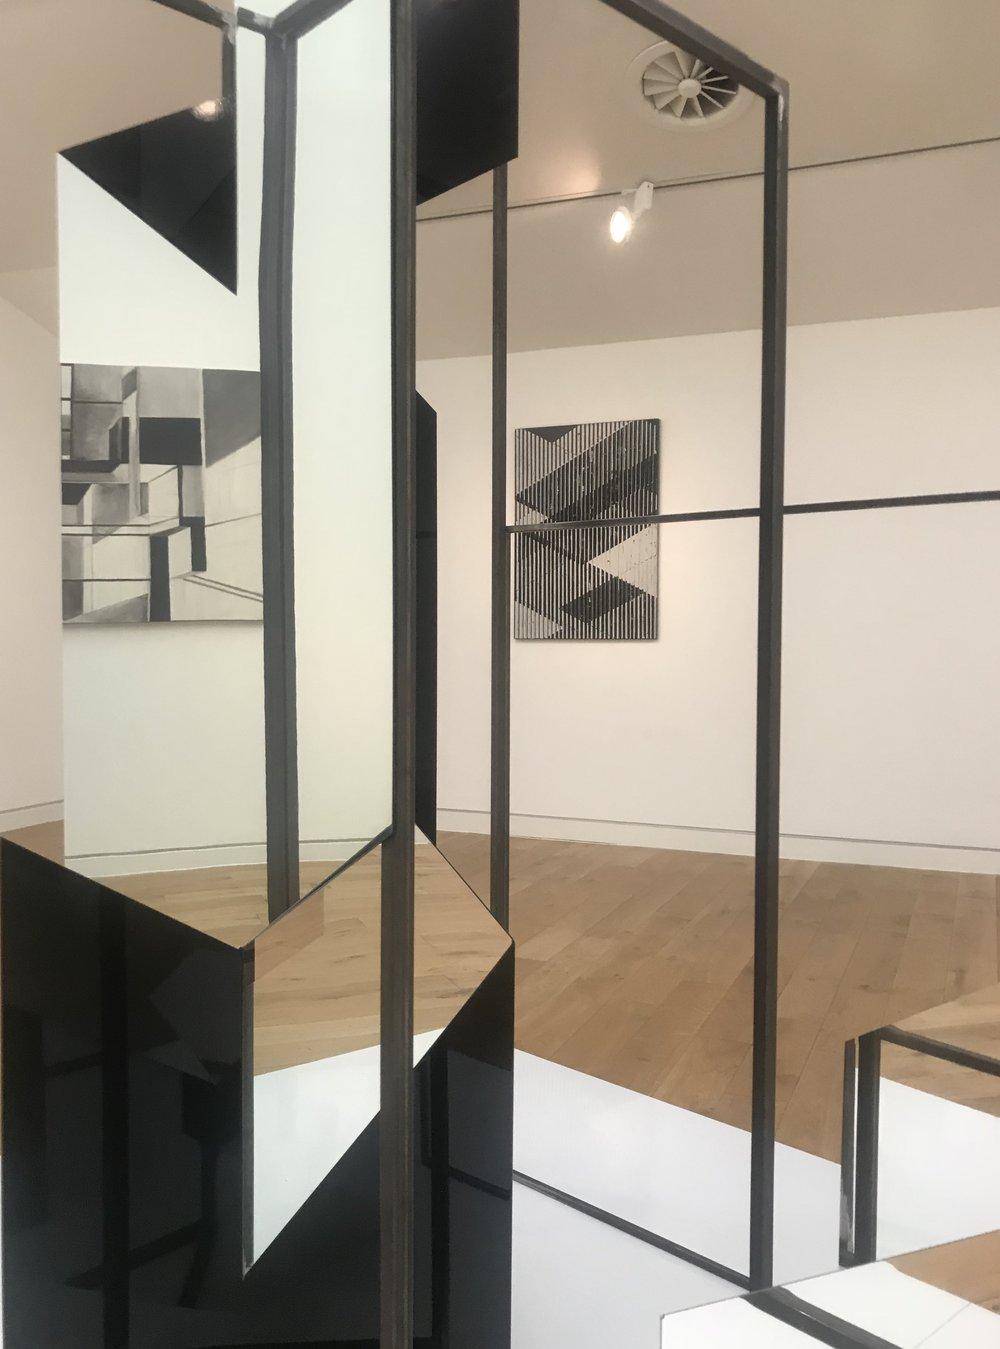 Border Controls. Rosalind Davis and Justin Hibbs Installation Shots at the Sevenoaks Kaleidoscope Gallery 2018. Photo 06-11-2018, 15 52 09.jpg